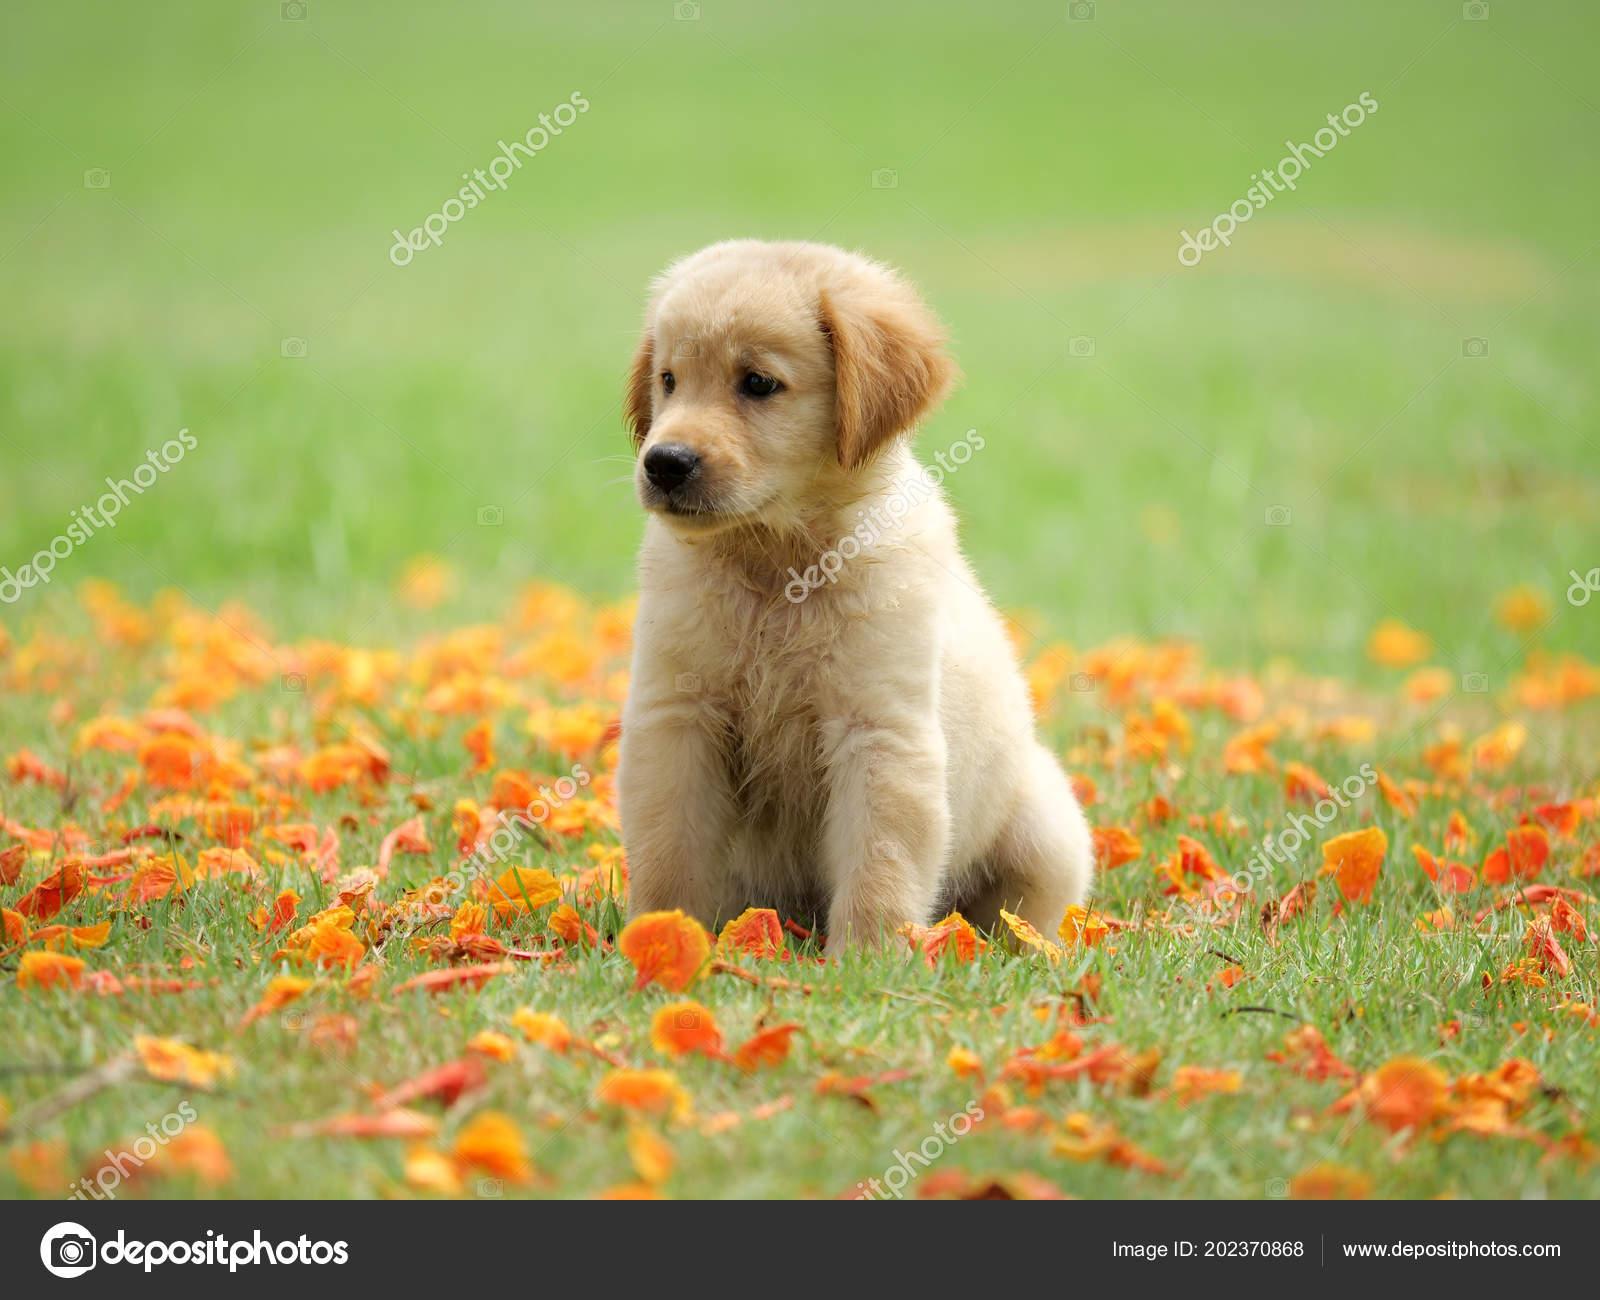 Cute Puppy Golden Retriever Running Park Stock Photo C Chayathon 202370868